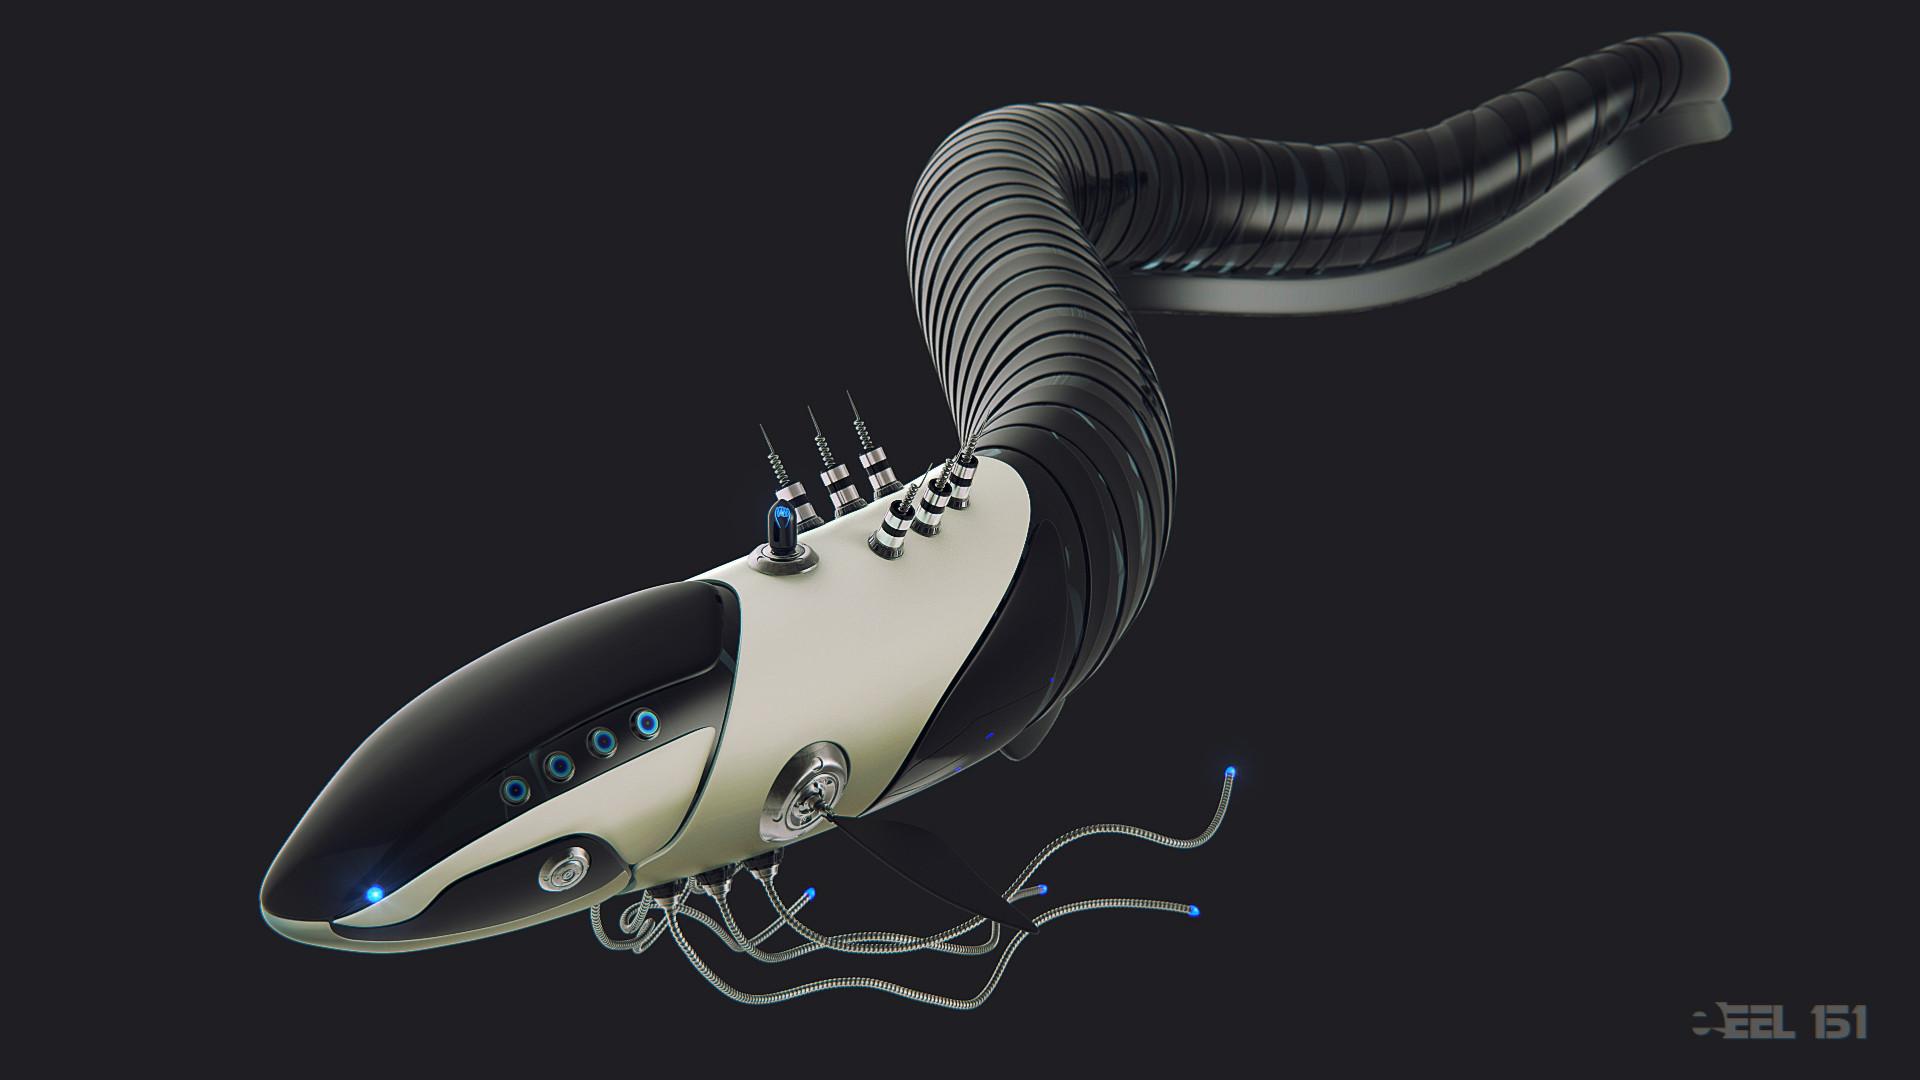 Riyx hasan e eel render